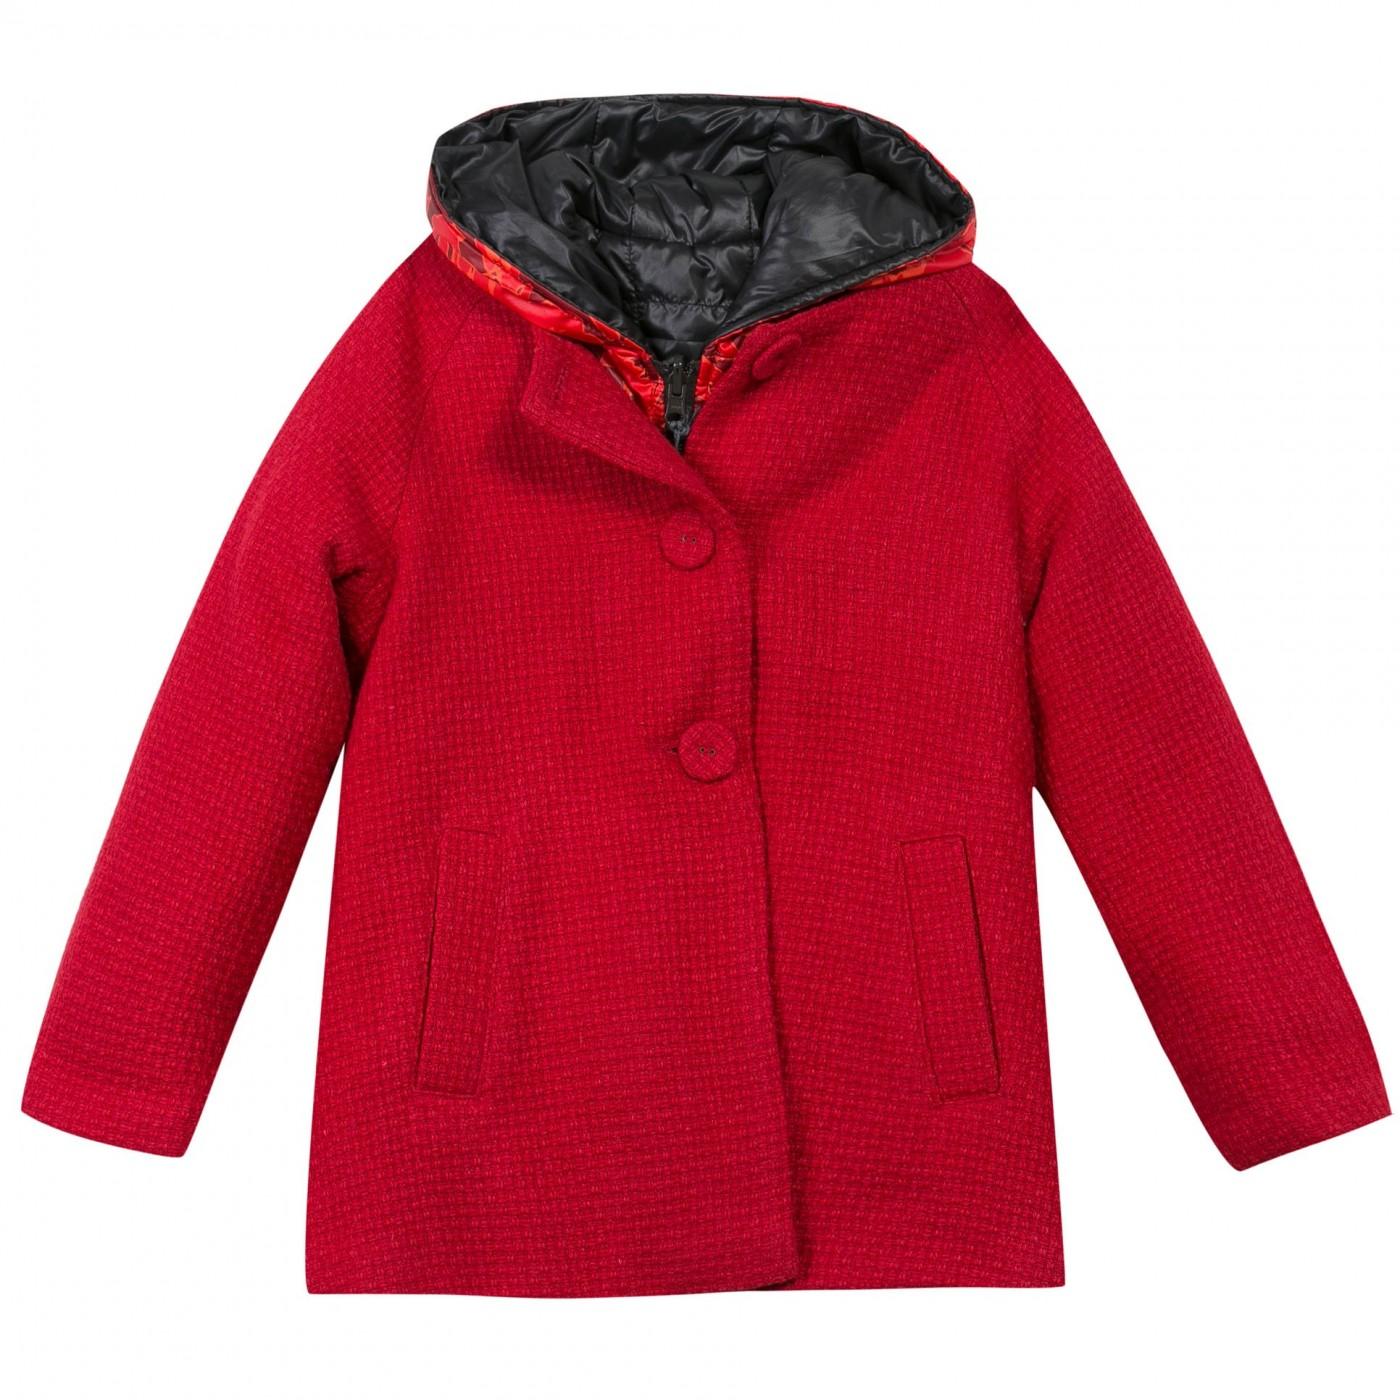 Пальто + куртка Catimini CG42035-03